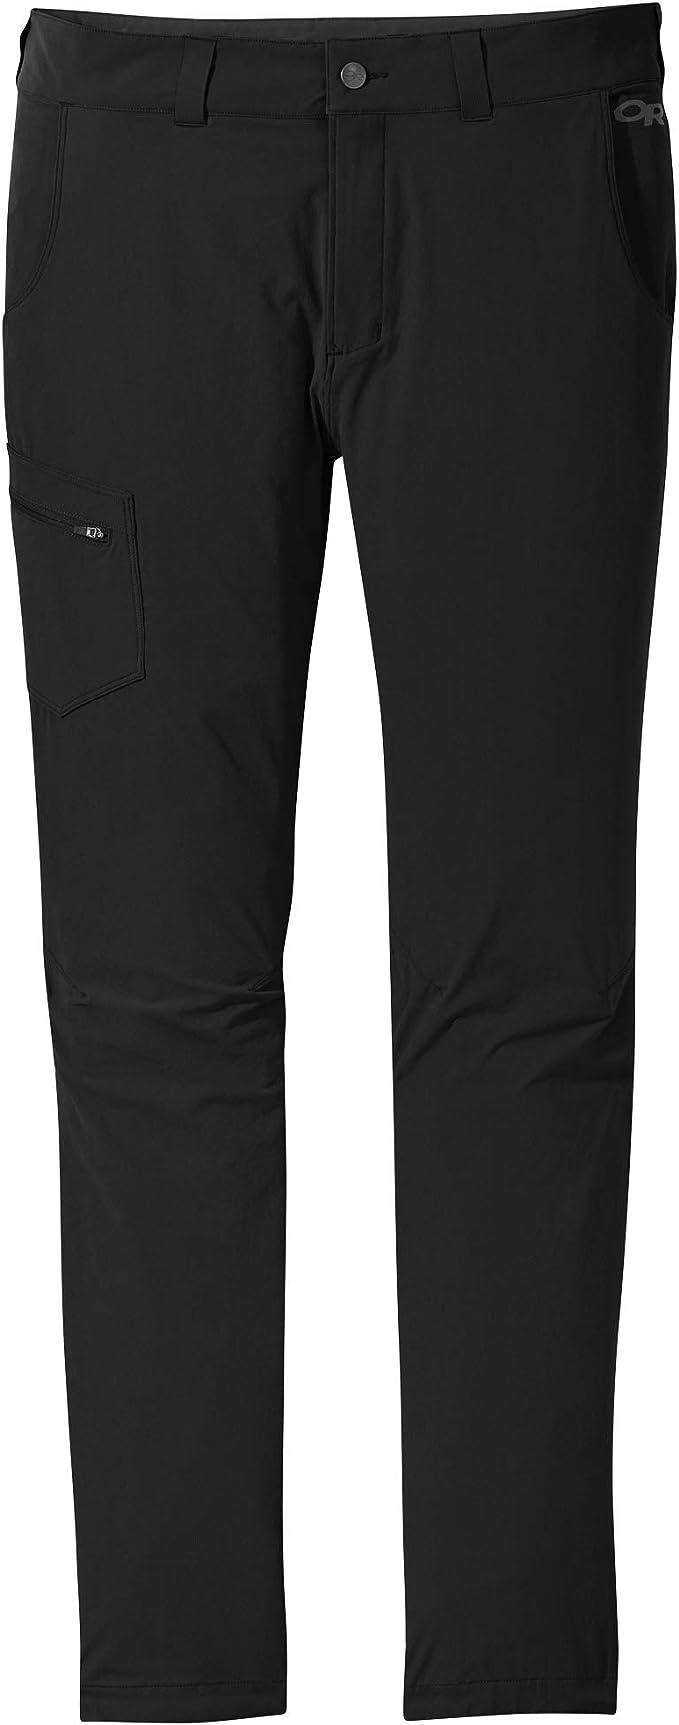 30 Outdoor Research Mens Ferrosi Pants